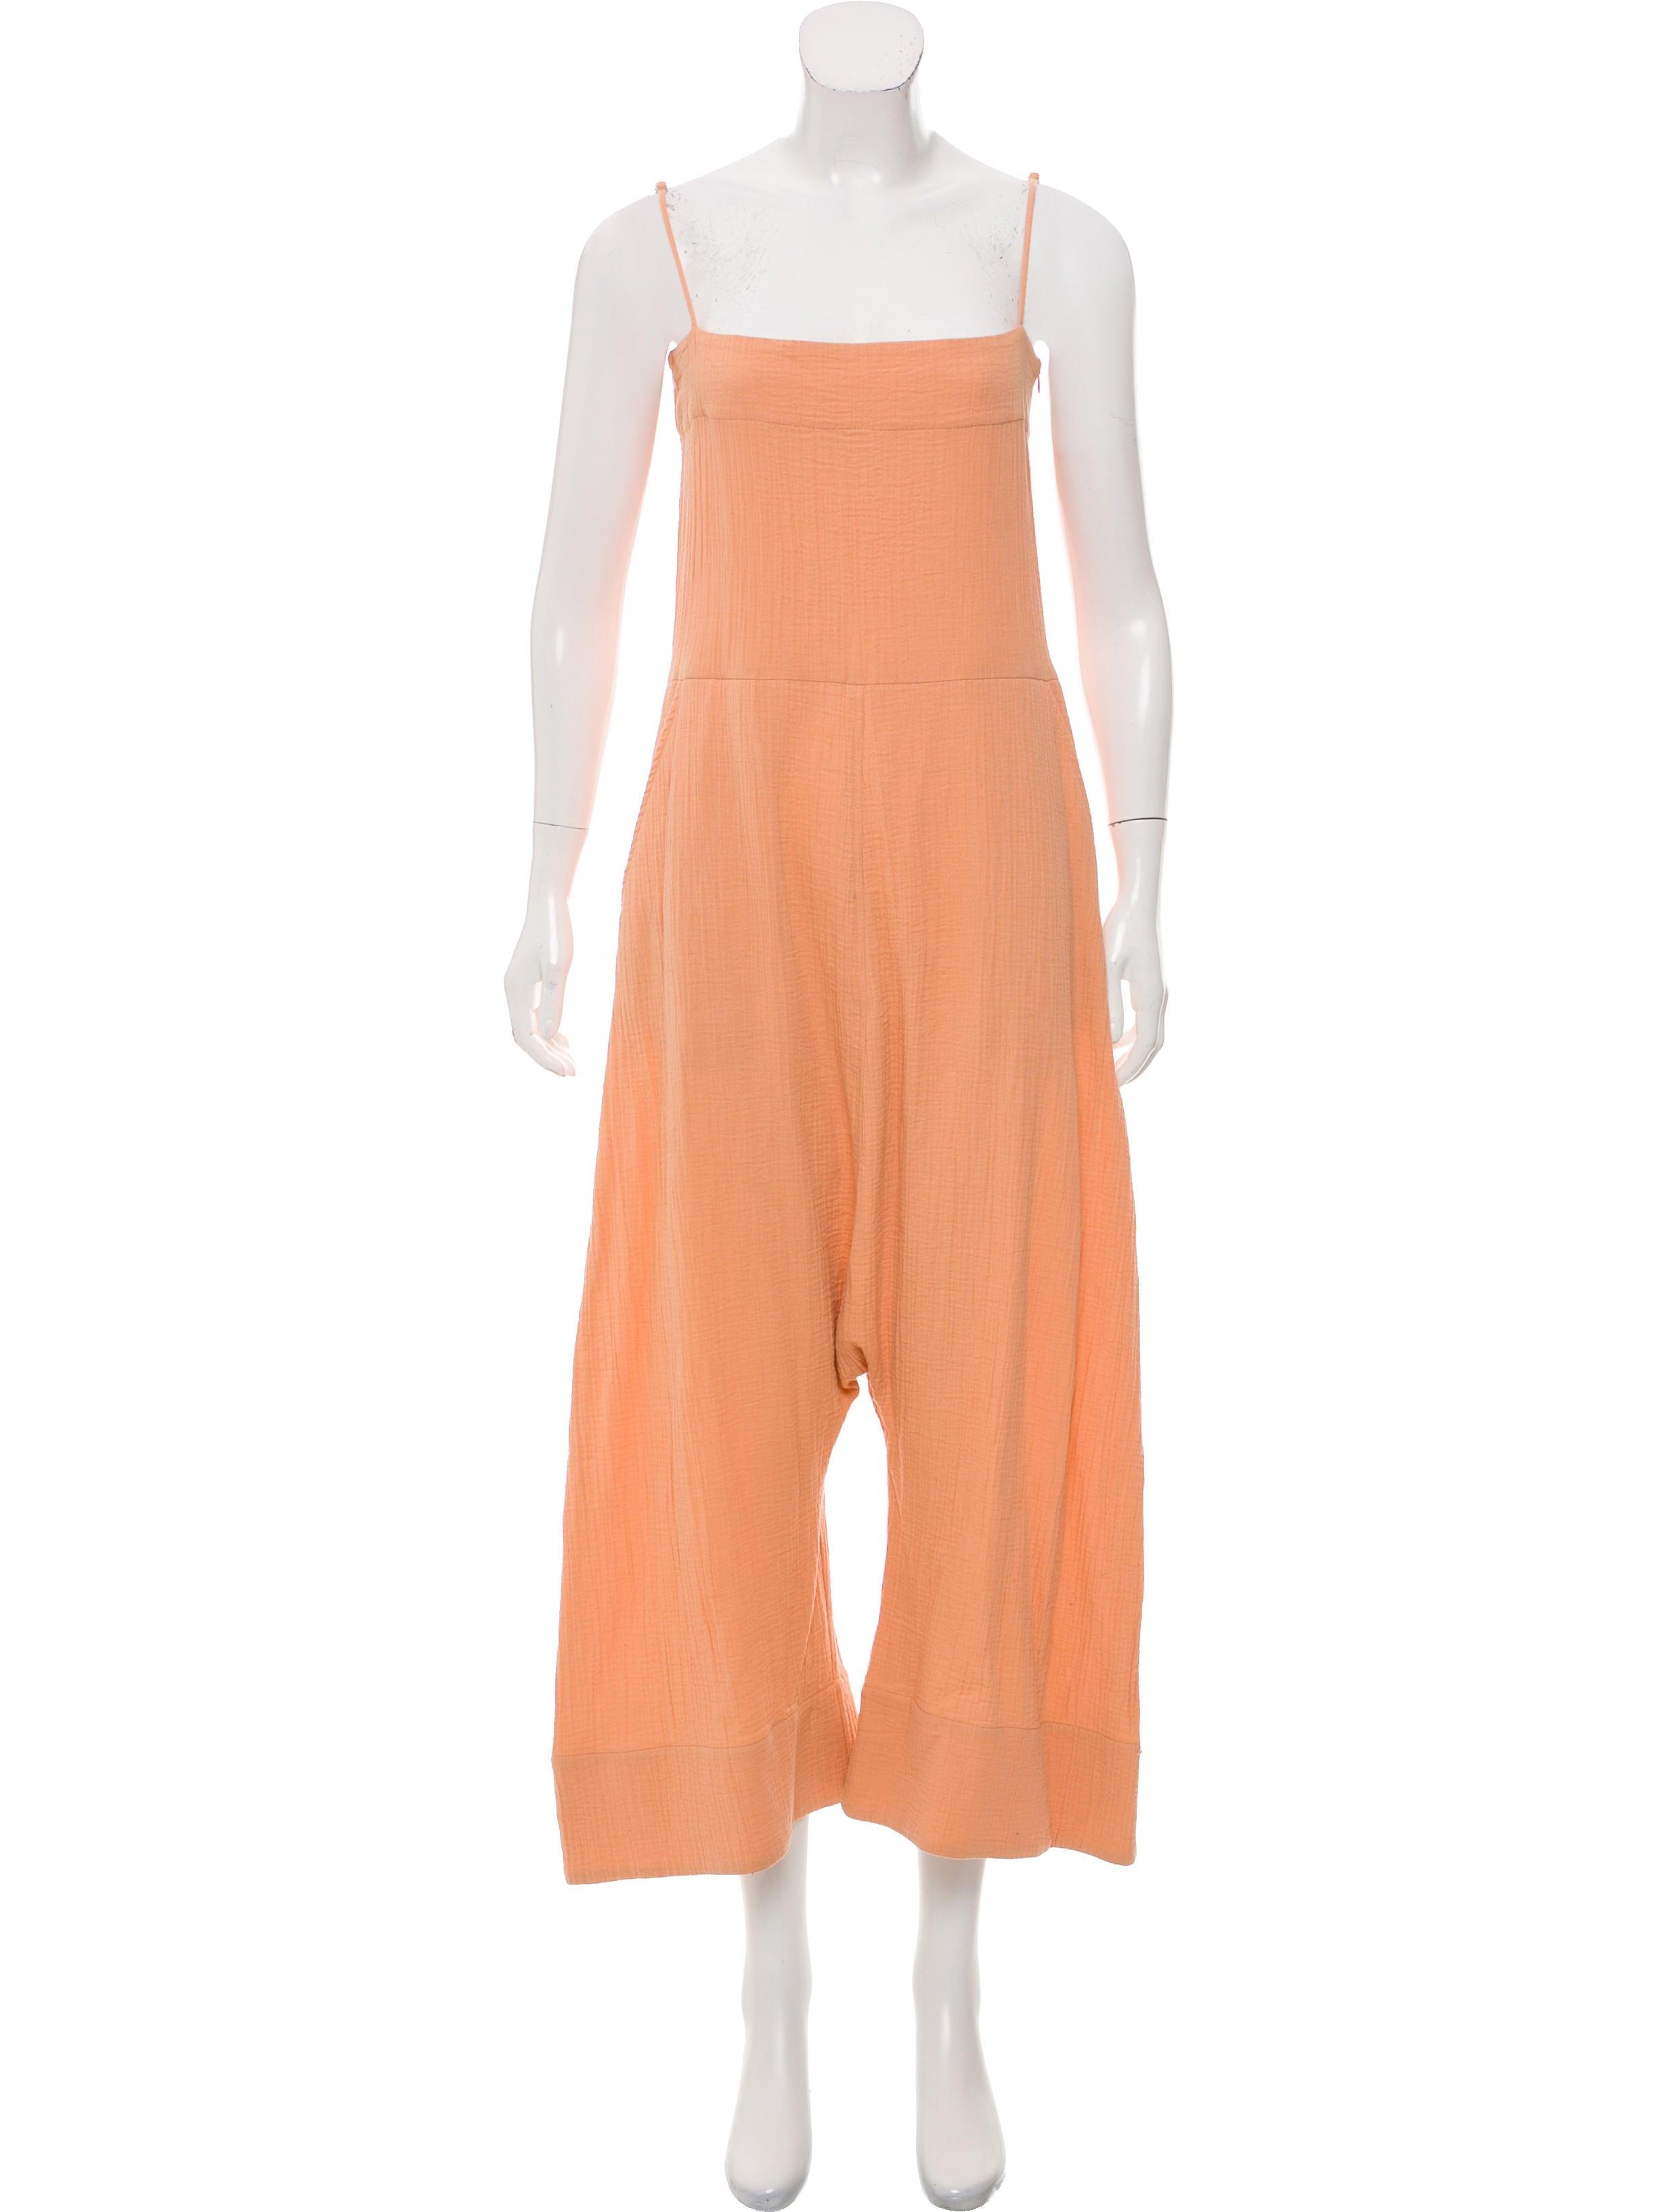 810f950567b5 Caron Callahan Mali Wide-Leg Jumpsuit w  Tags - Clothing ...